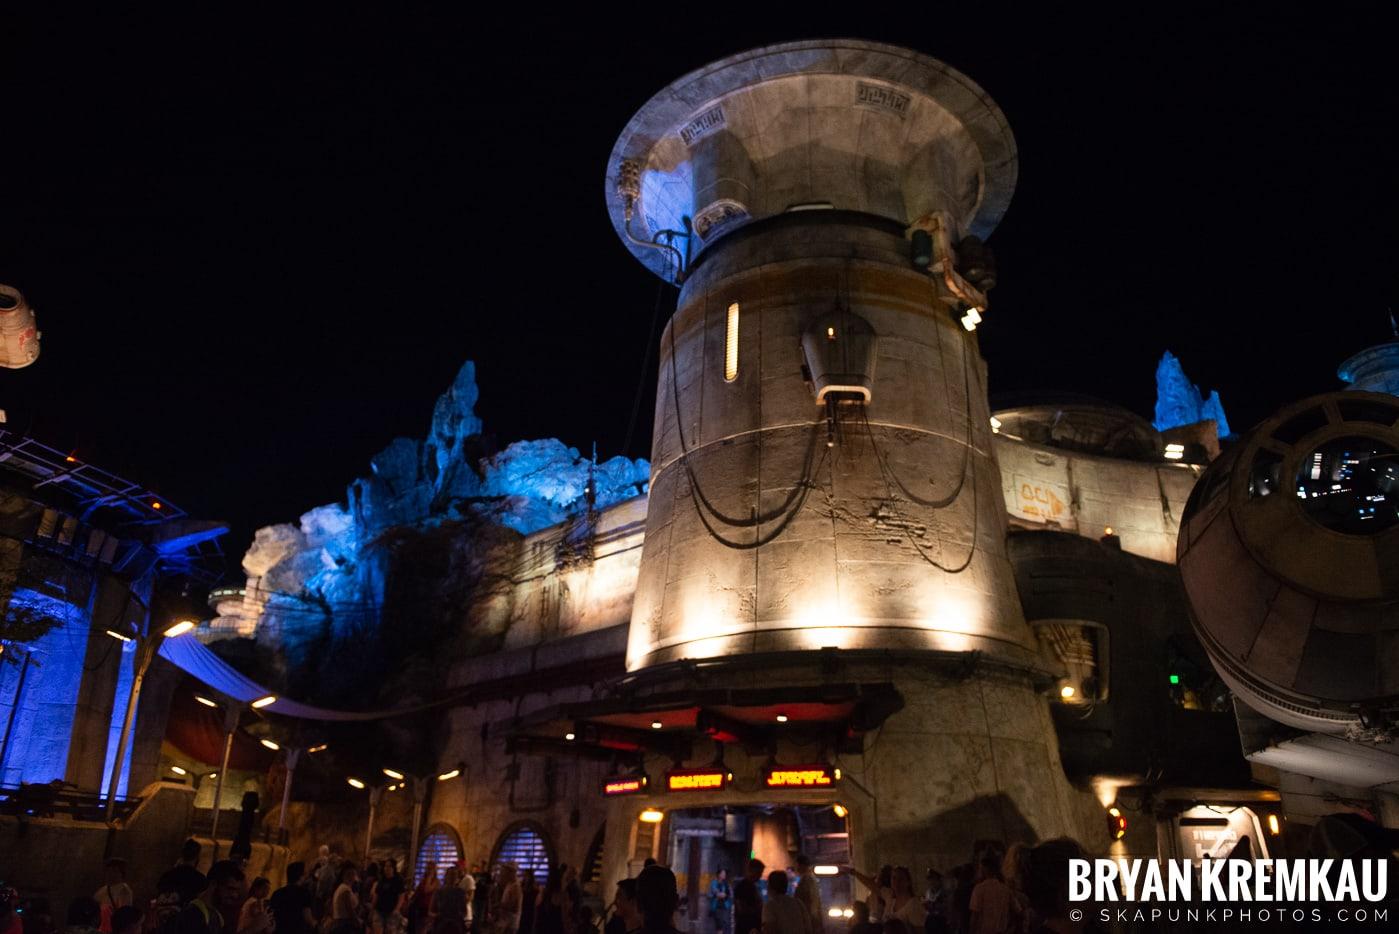 Walt Disney World Vacation: Day 6 (Magic Kingdom, Epcot, Disney's Hollywood Studios) - 10.4.19 (13)